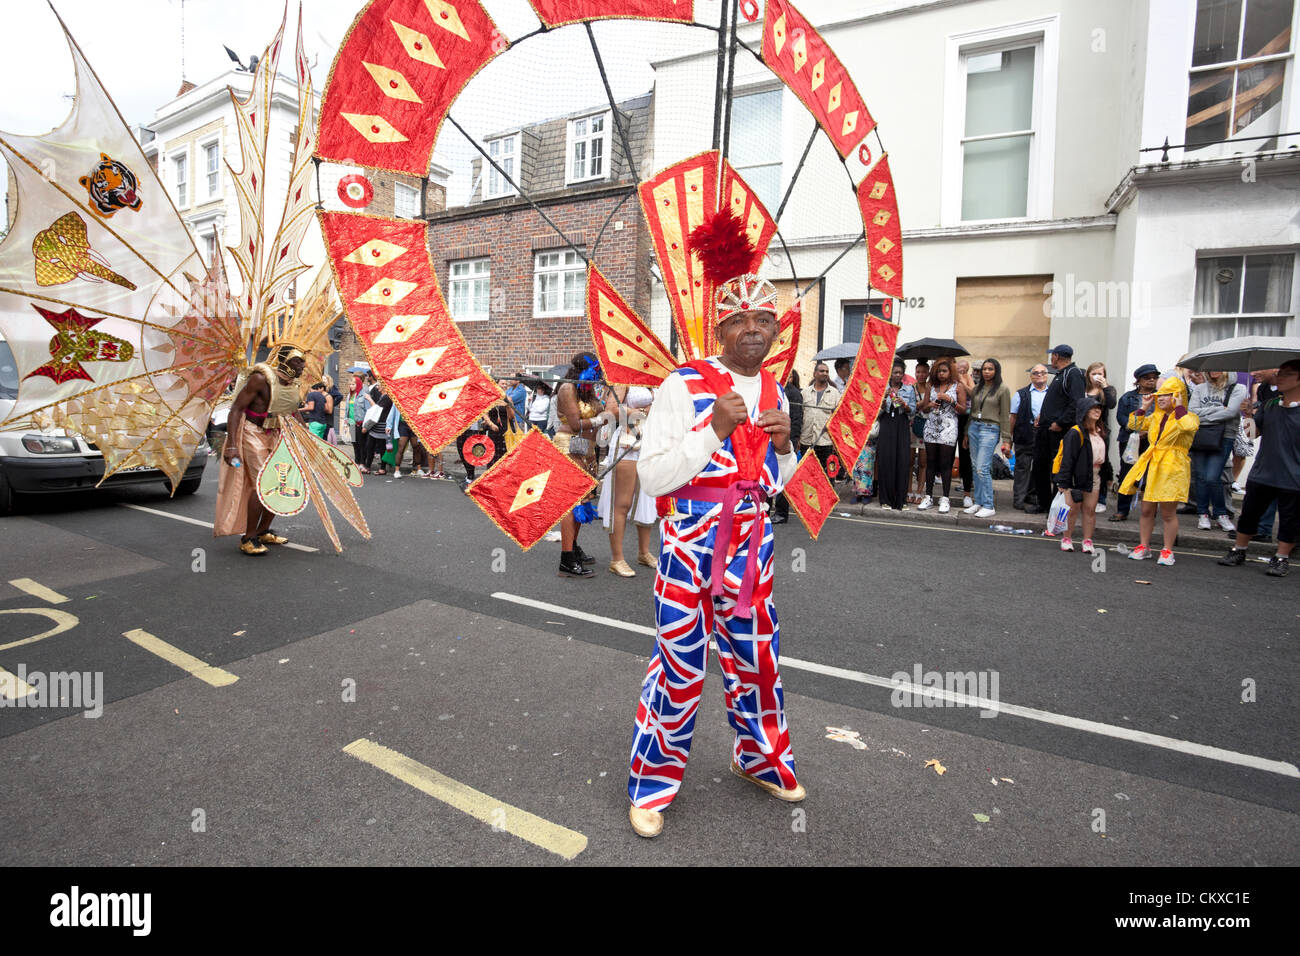 August 27th, 2012, London, UK. Notting Hill Carnival senior dancer wears colourful costume. - Stock Image